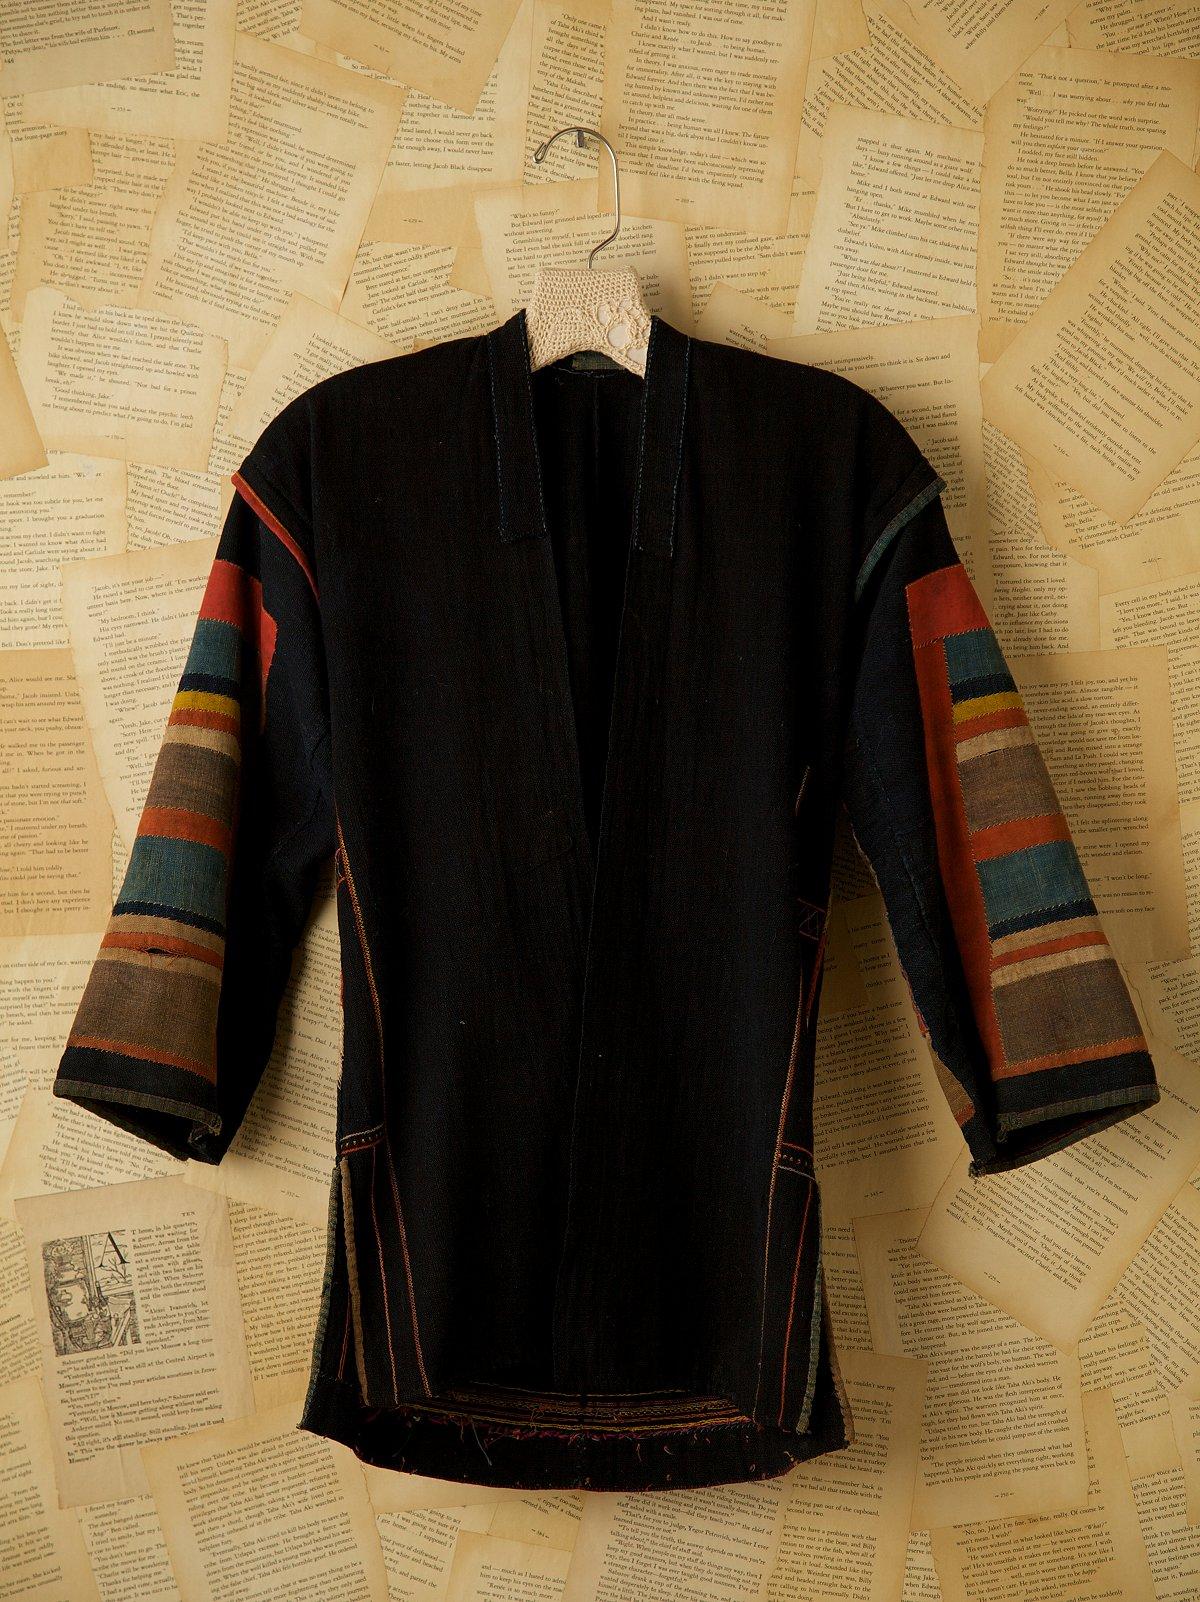 Vintage Vietnamese Cotton Jacket